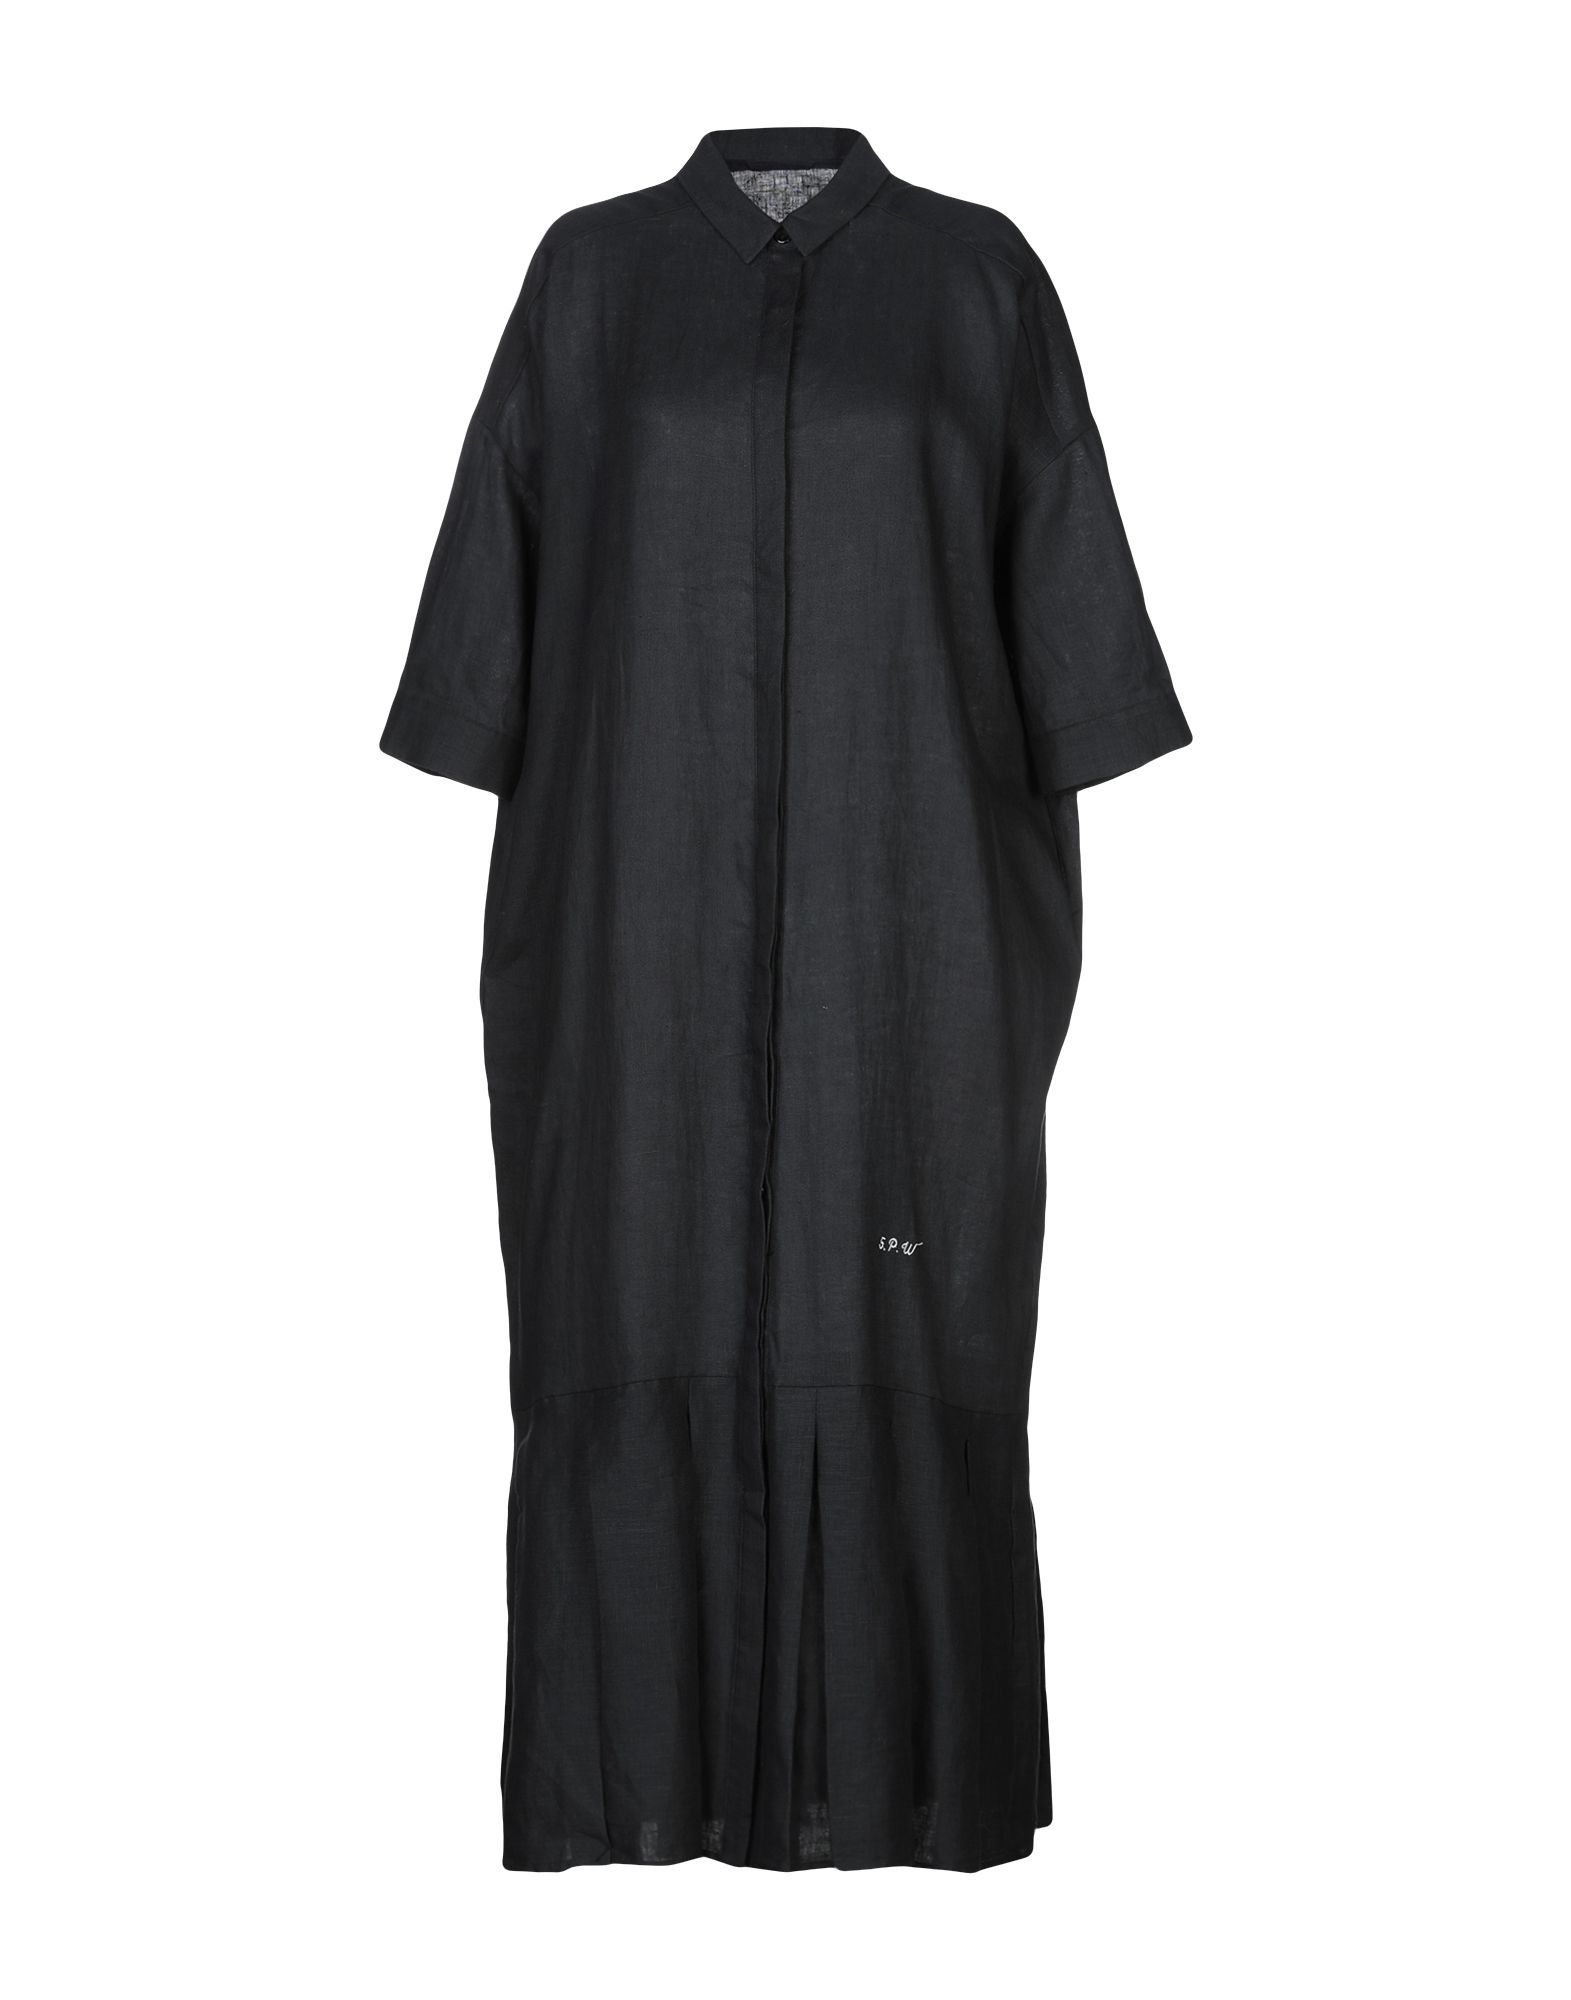 5PREVIEW Платье длиной 3/4 neeru kumar платье длиной 3 4